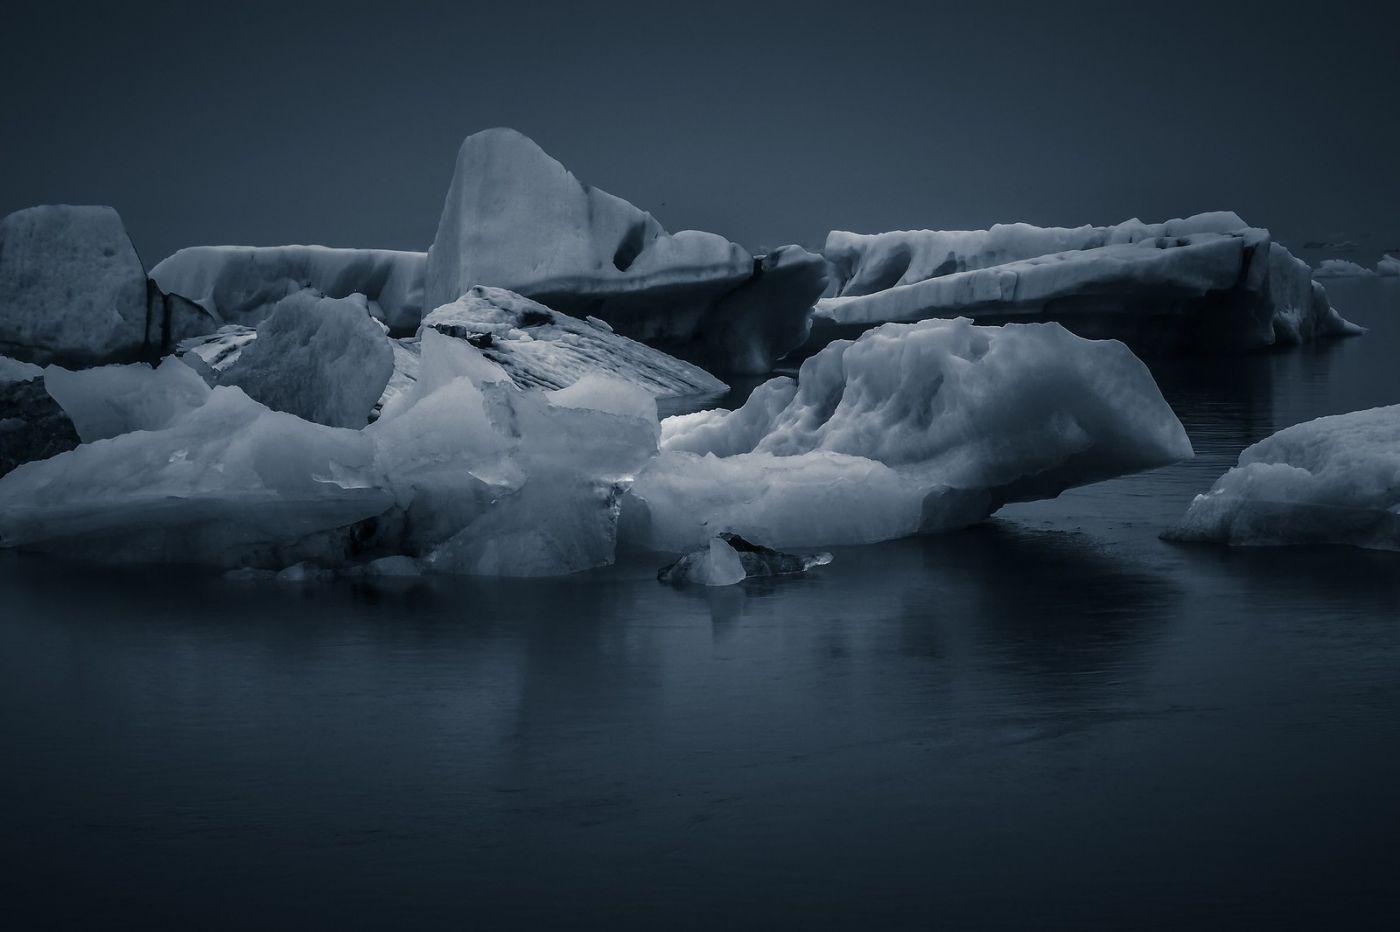 冰岛冰川泻湖(Glacier Lagoon),流动的冰川_图1-10